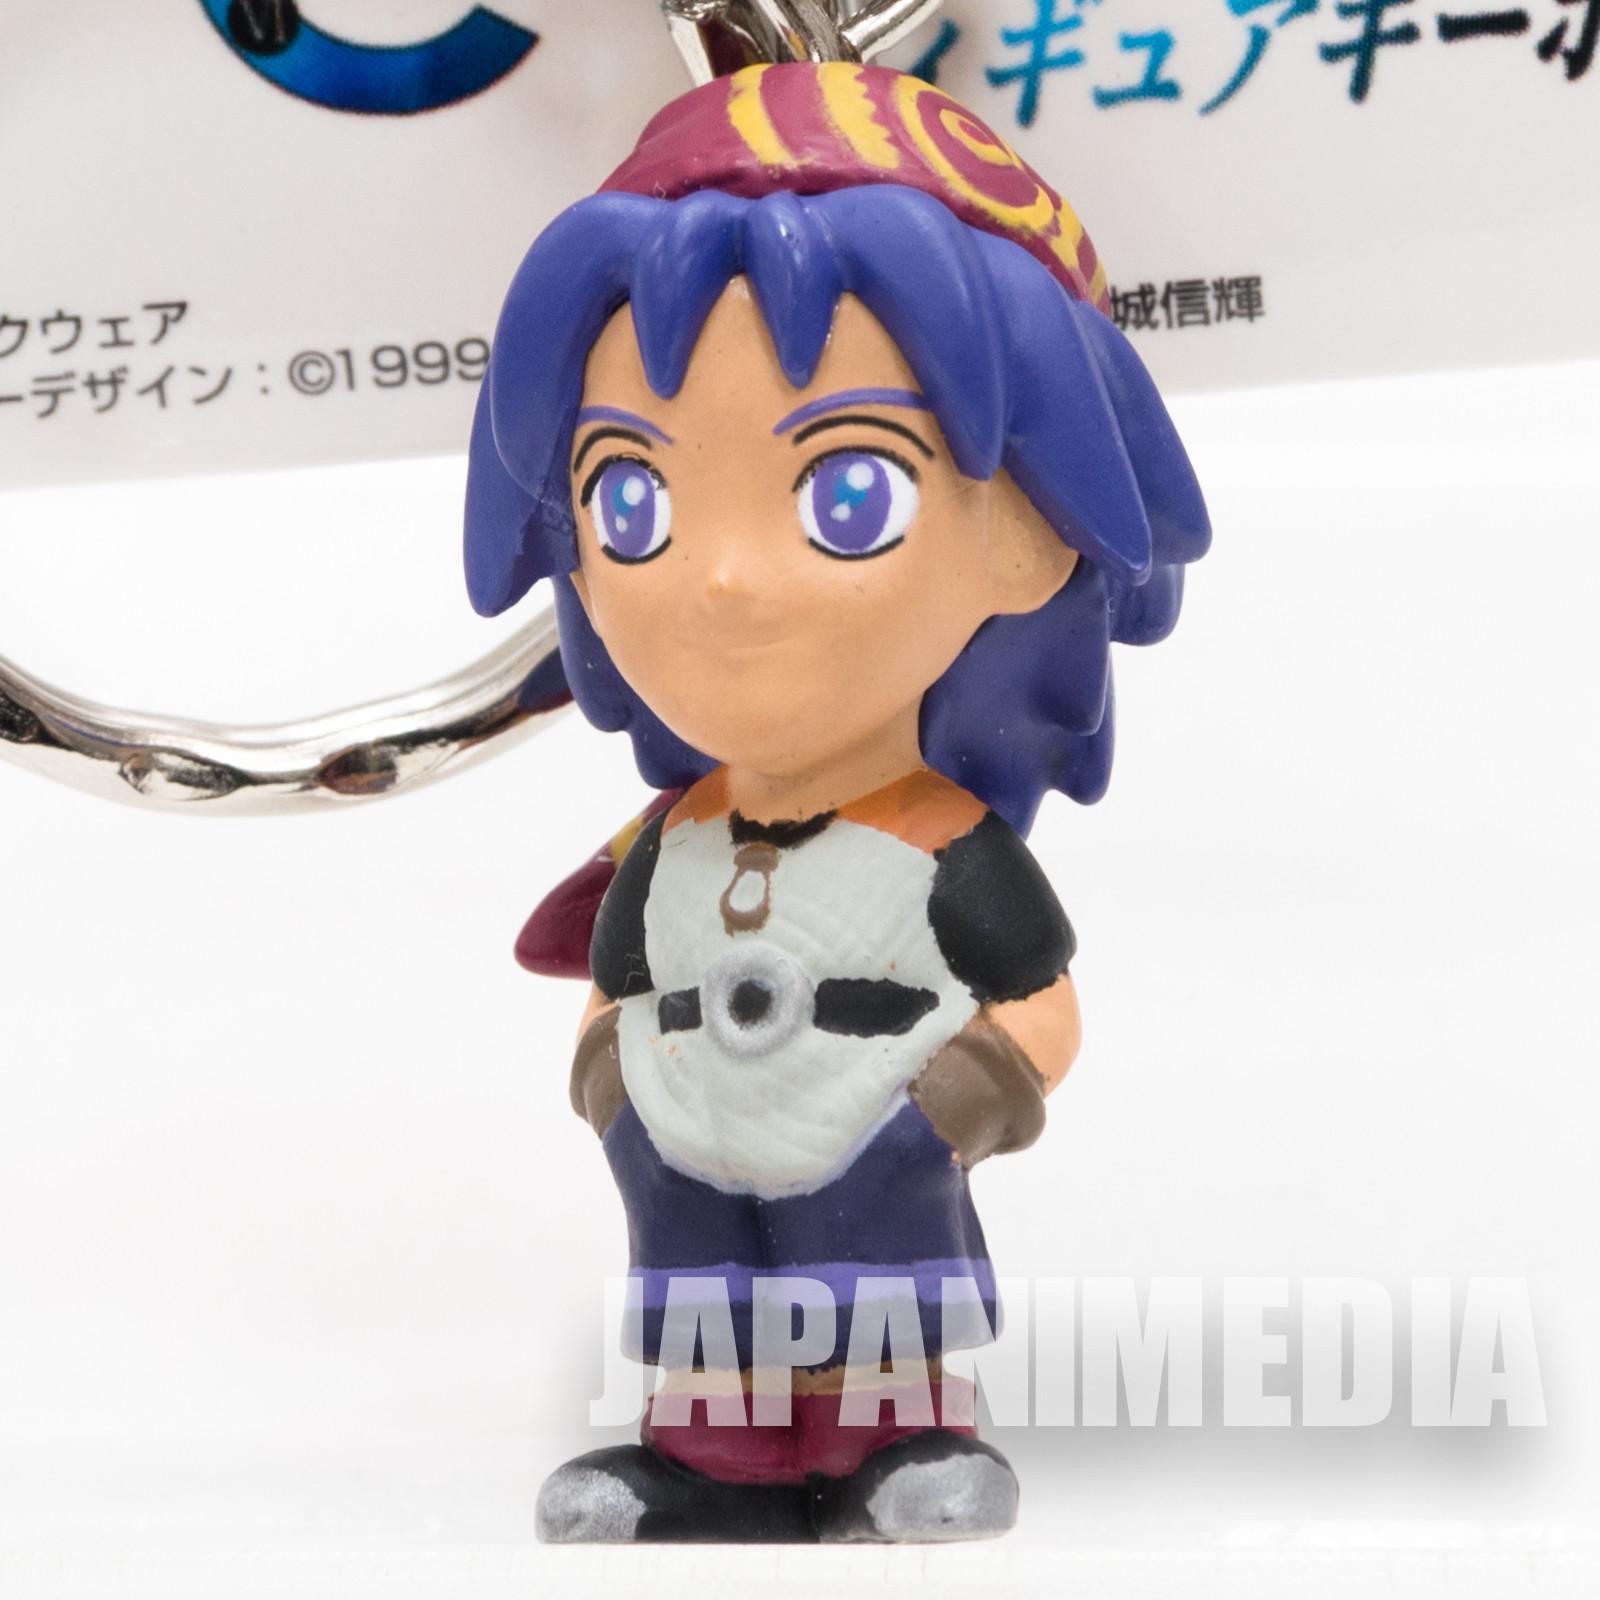 RARE! Chrono Cross Serge Figure Keychain Banpresto JAPAN GAME